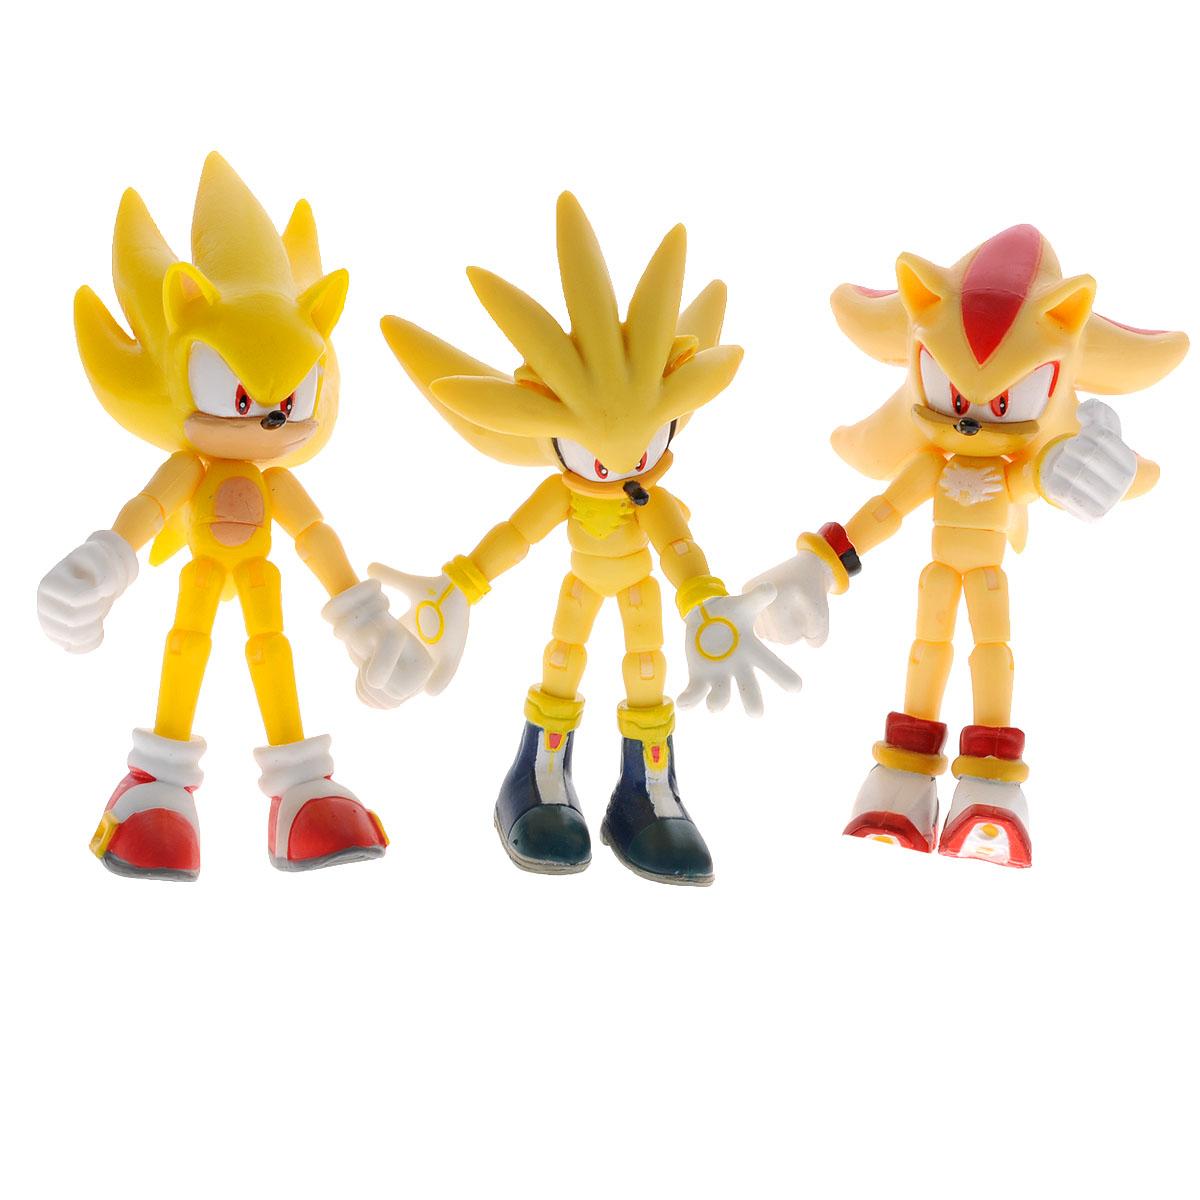 Набор фигурок Sonic Super Pack, с аксессуарами, 3 шт набор фигурок cut the rope 2 pack 9